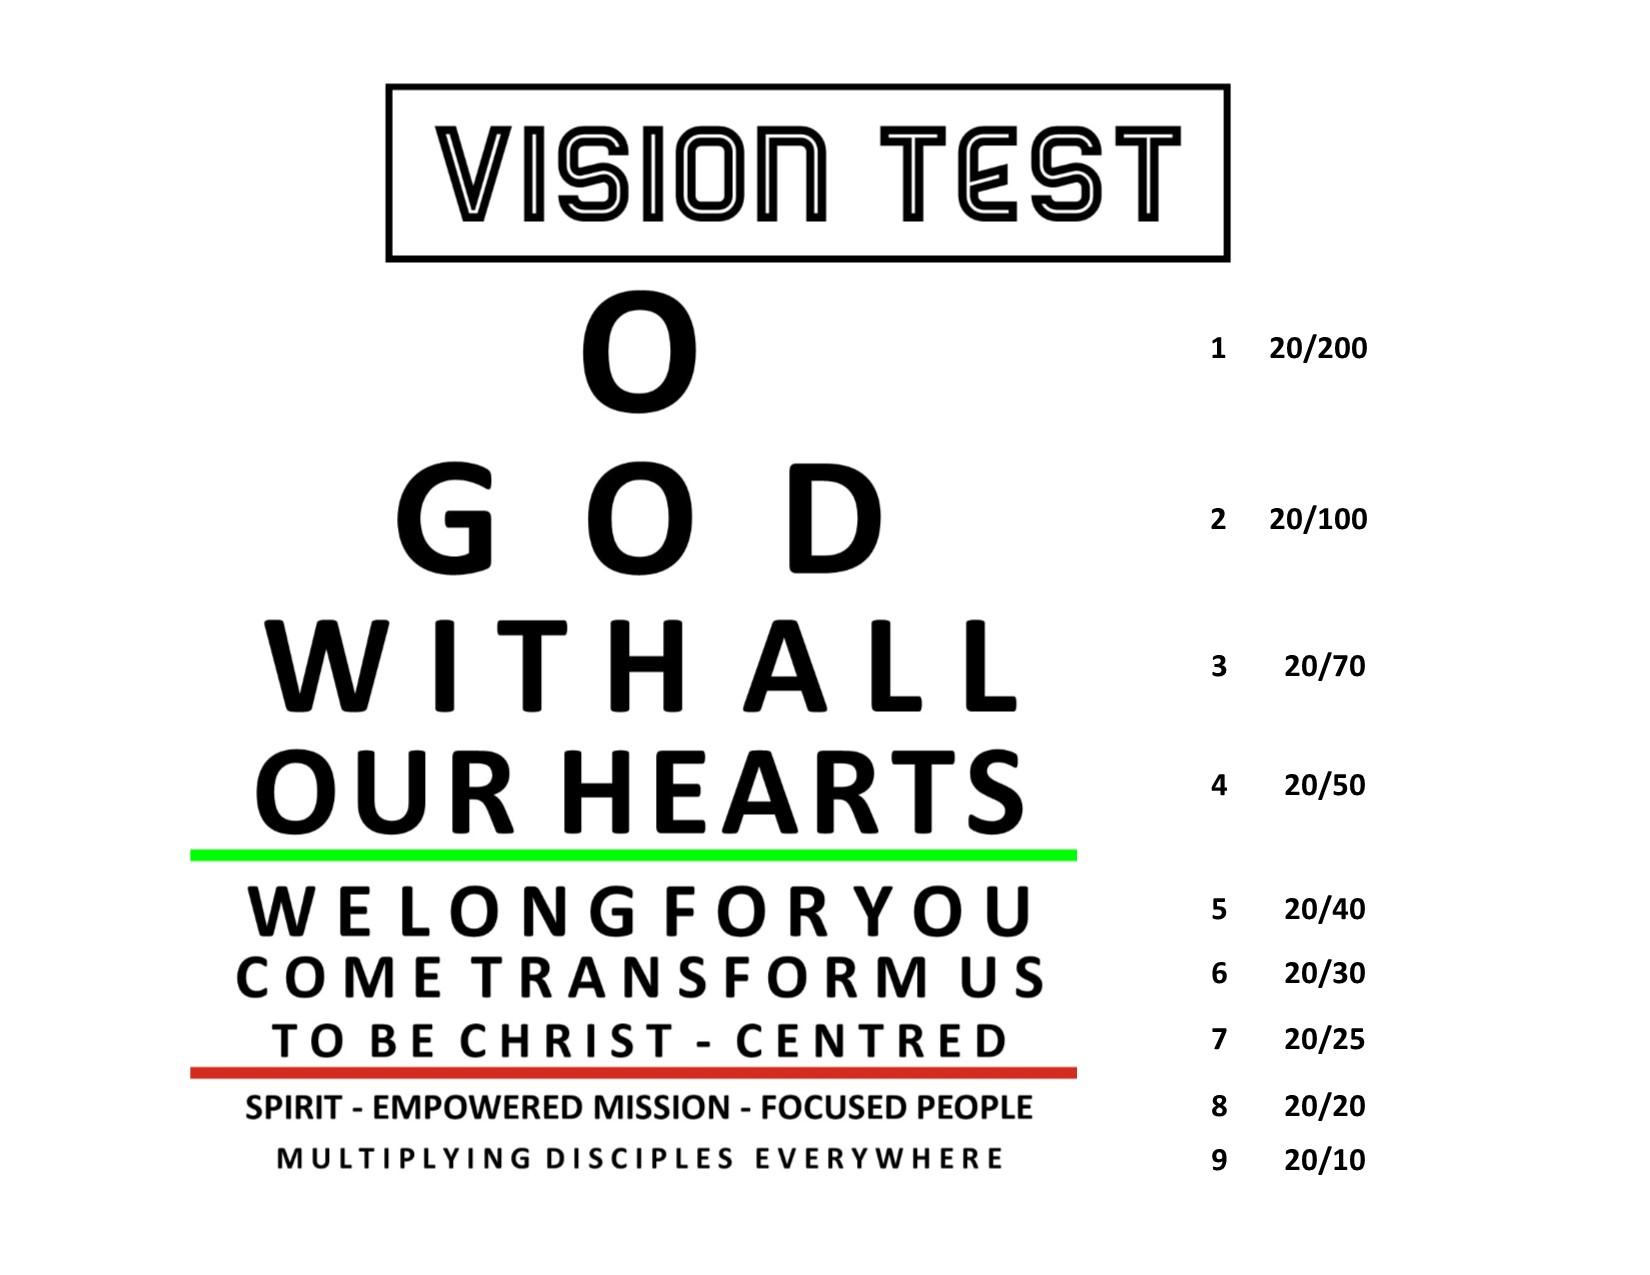 94 20 40 Vision Test